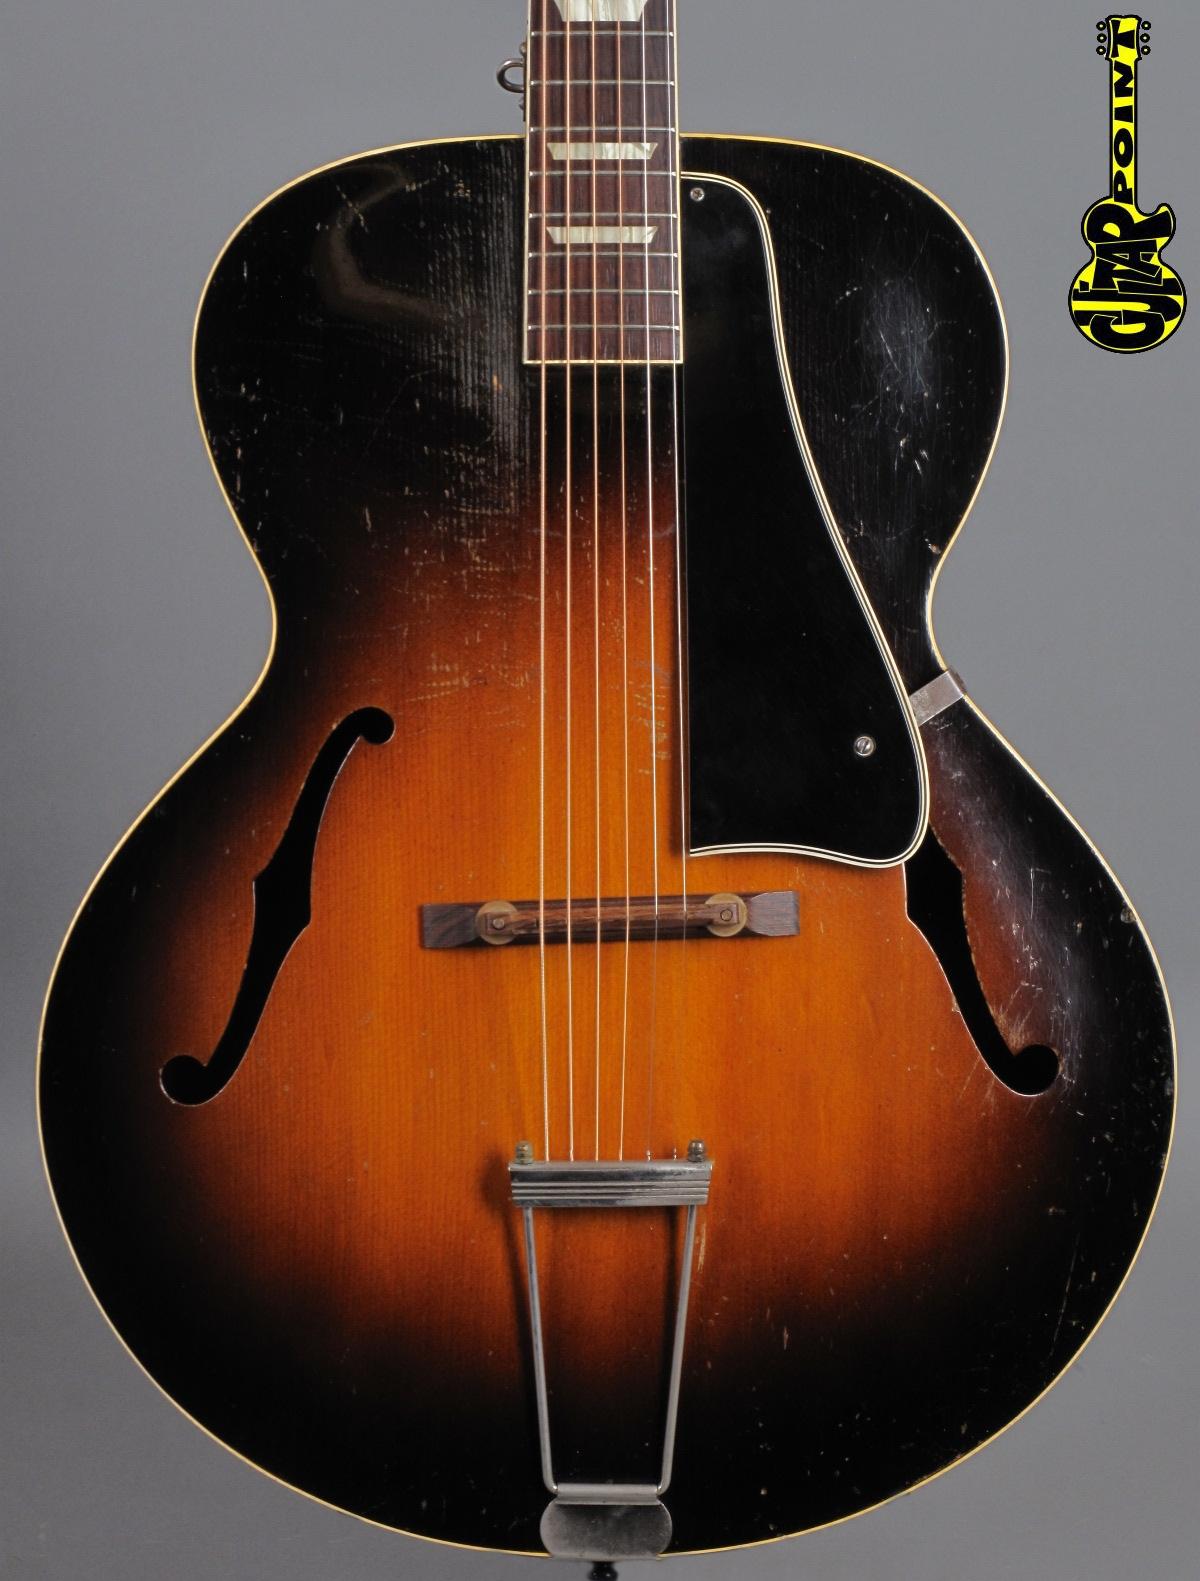 1951 Gibson L-50 - Sunburst